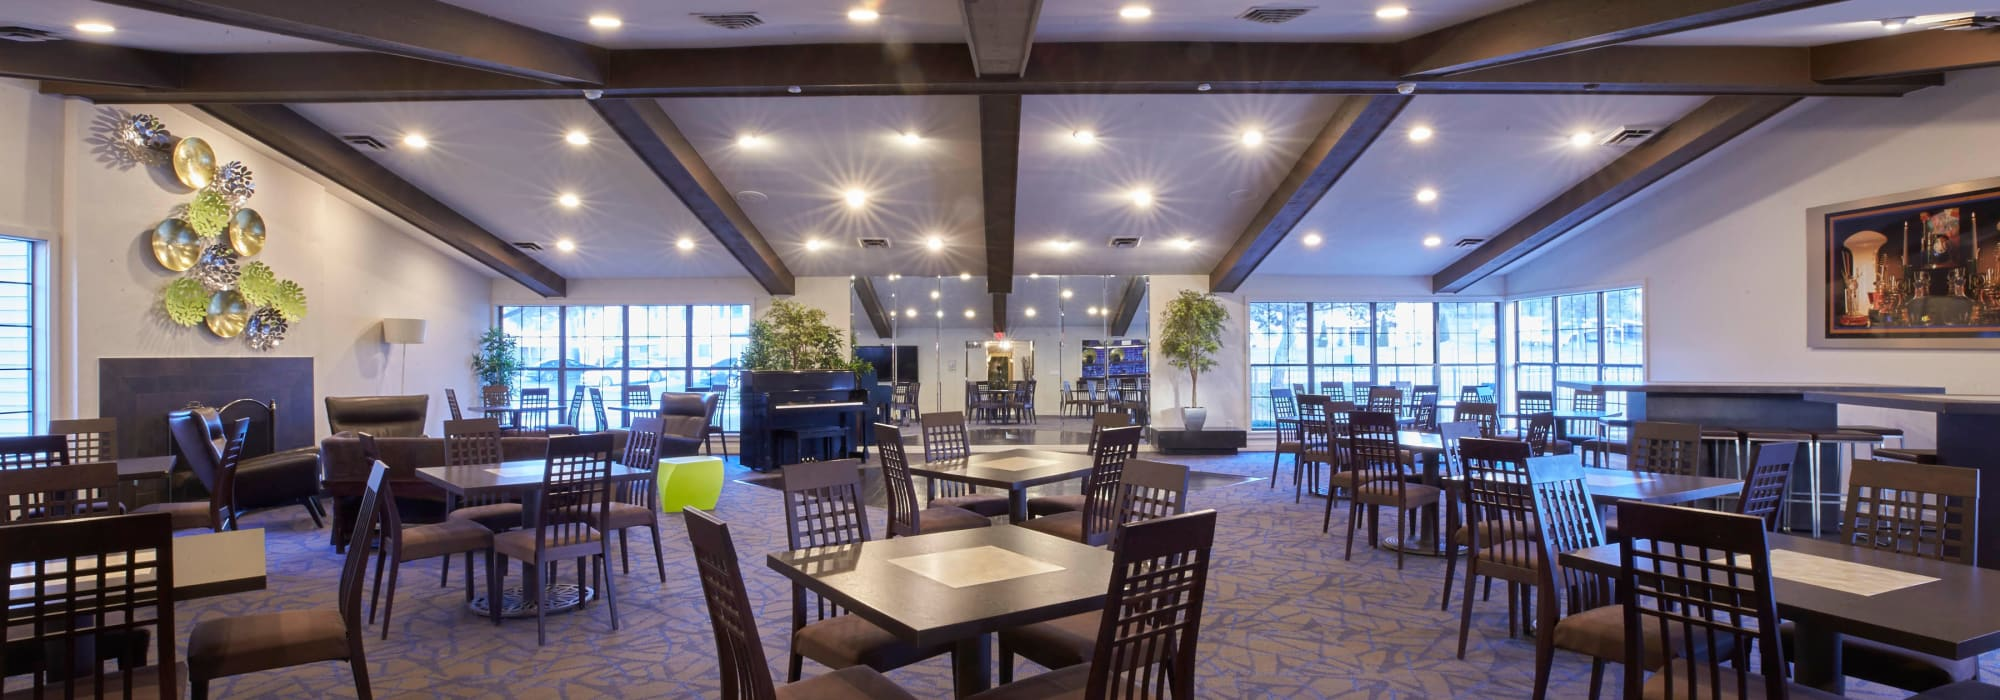 Interior of clubhouse at Muirwood in Farmington/Farmington Hills, Michigan